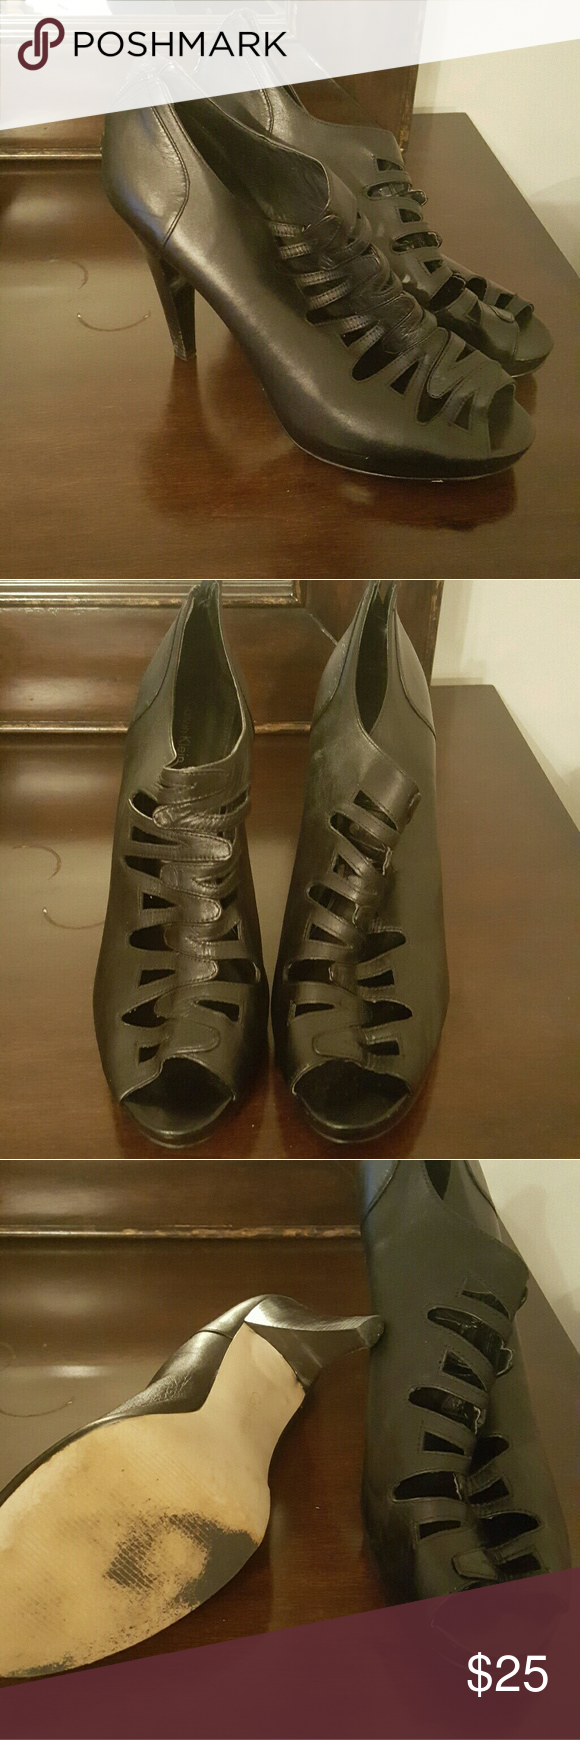 Heels Black Kenneth Cole shoes Shoes Heels